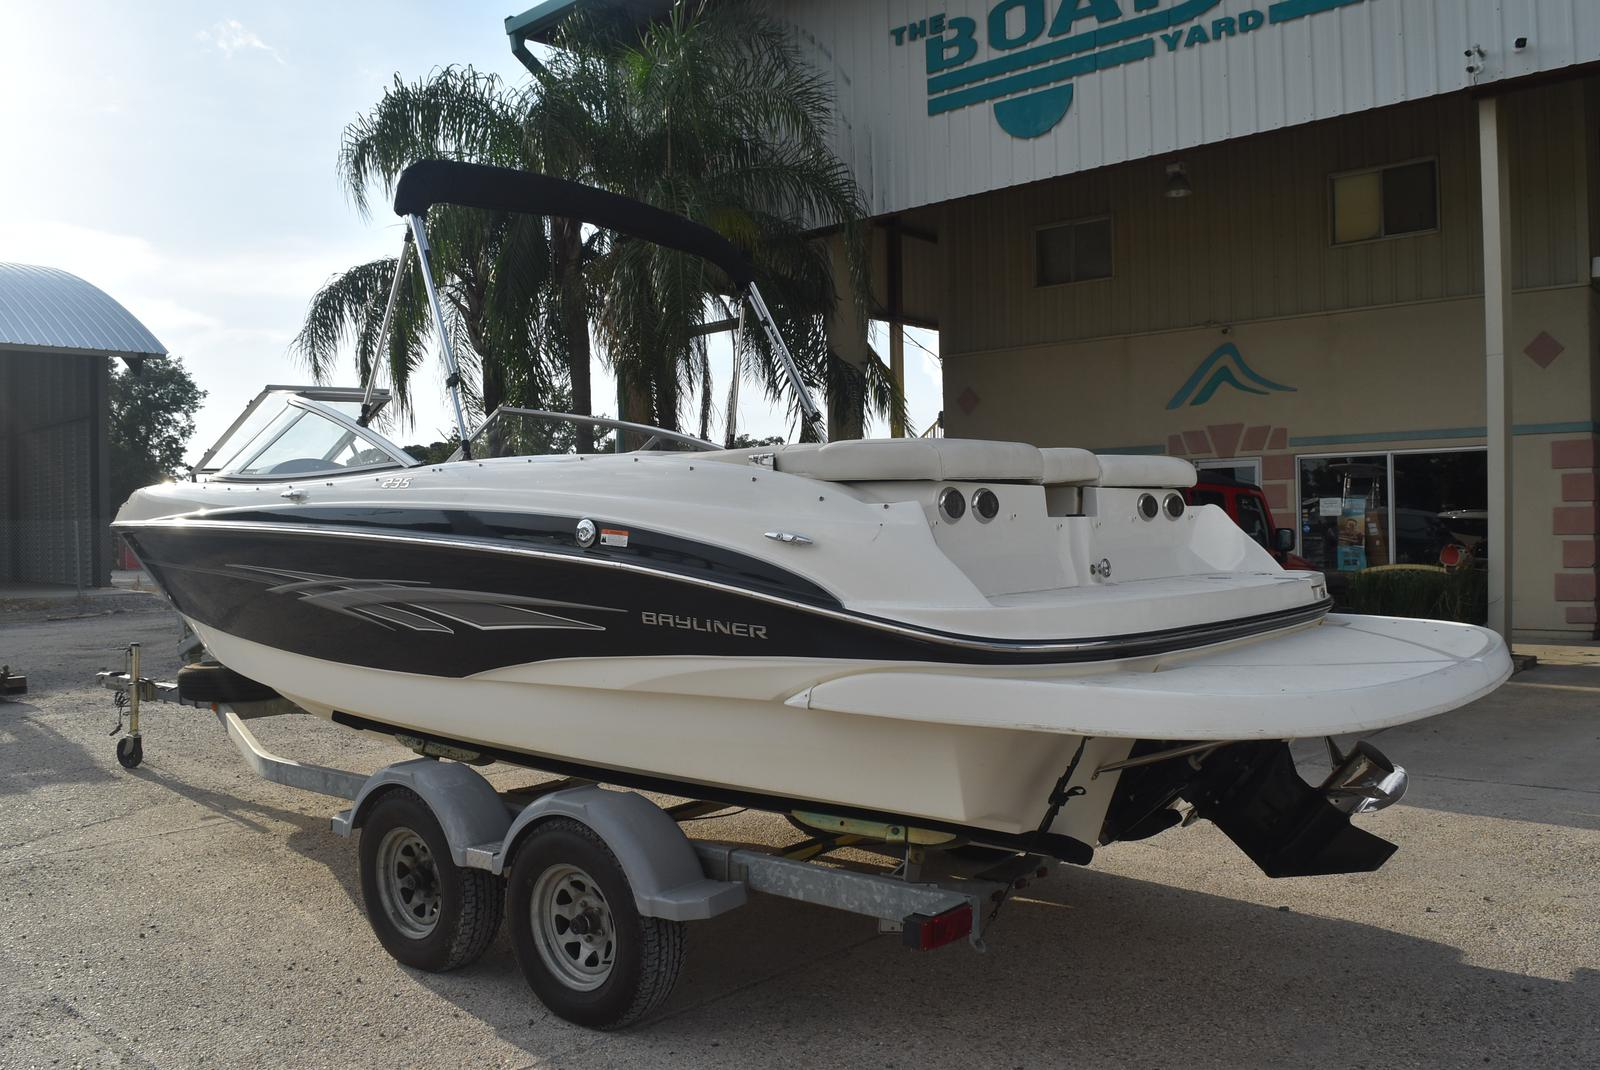 2010 Bayliner boat for sale, model of the boat is 235BR & Image # 21 of 43